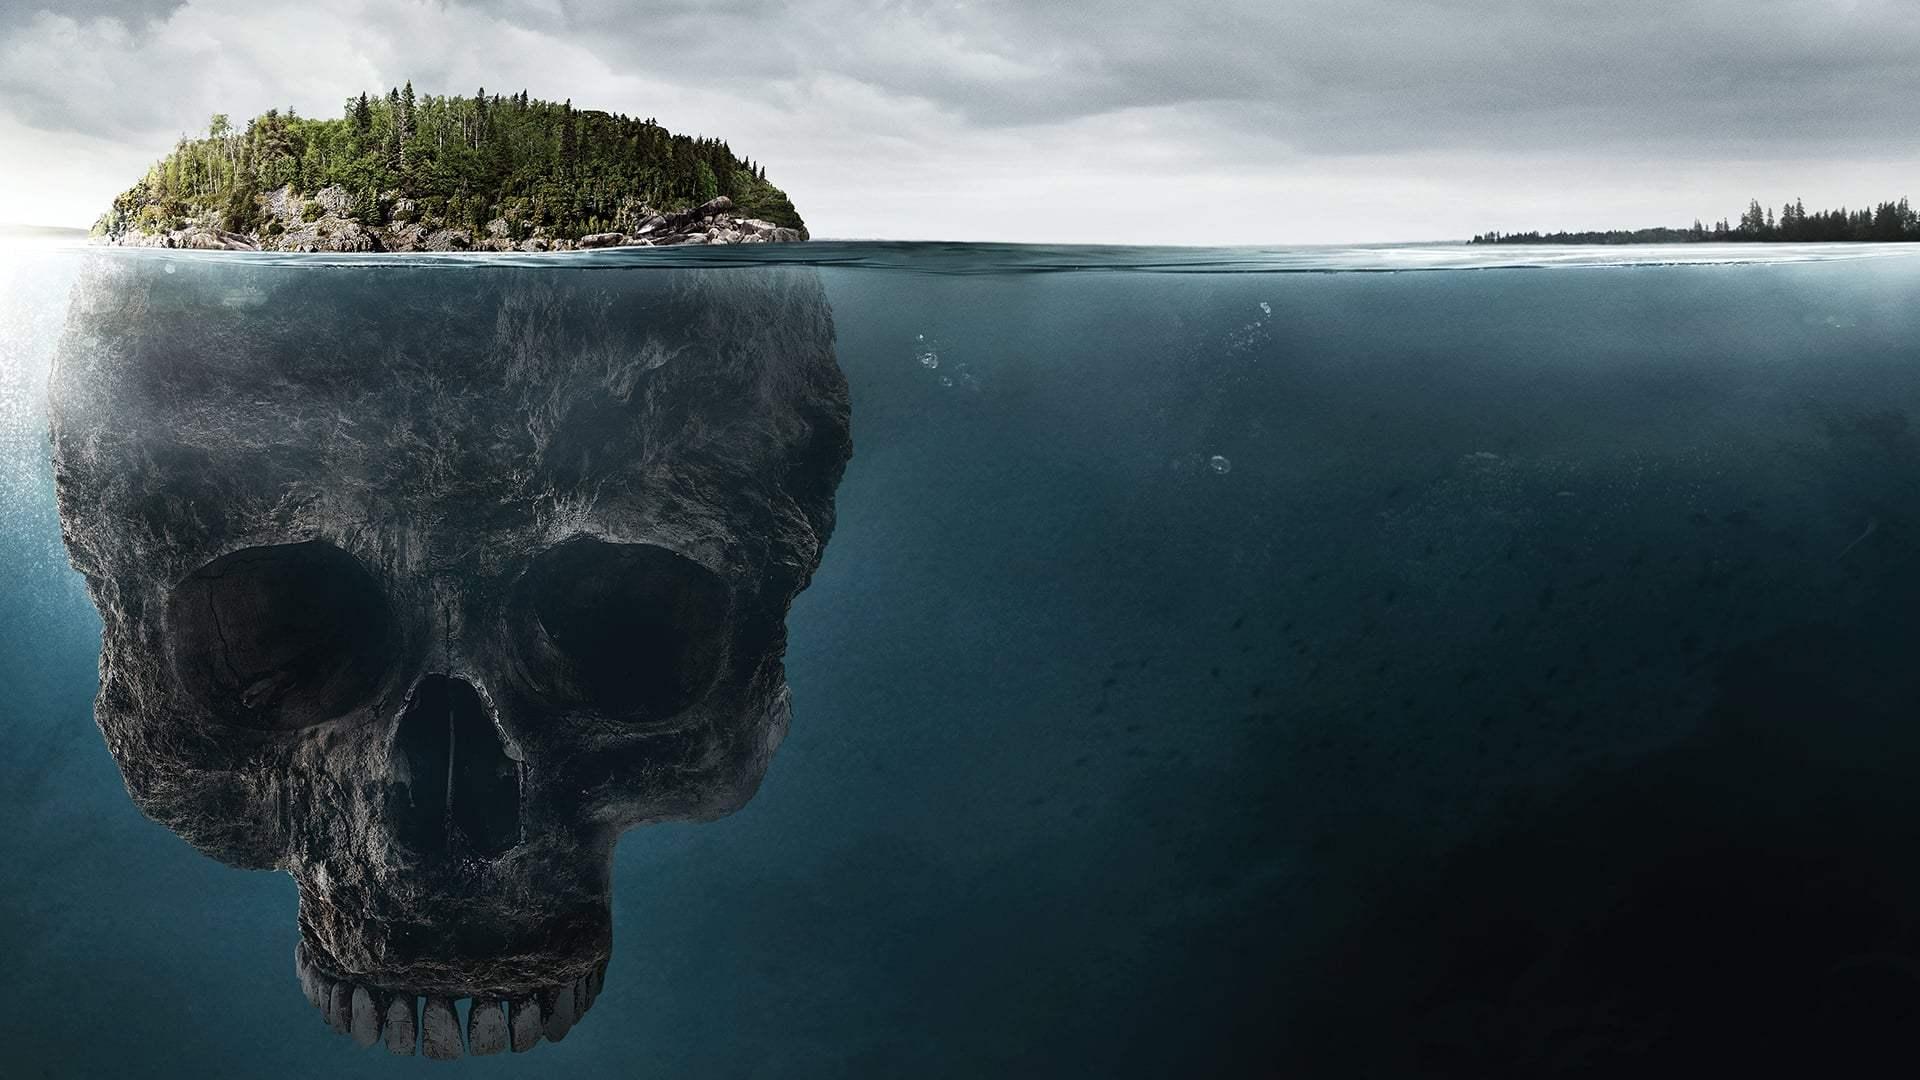 The Curse of Oak Island Season 8 Episode 4